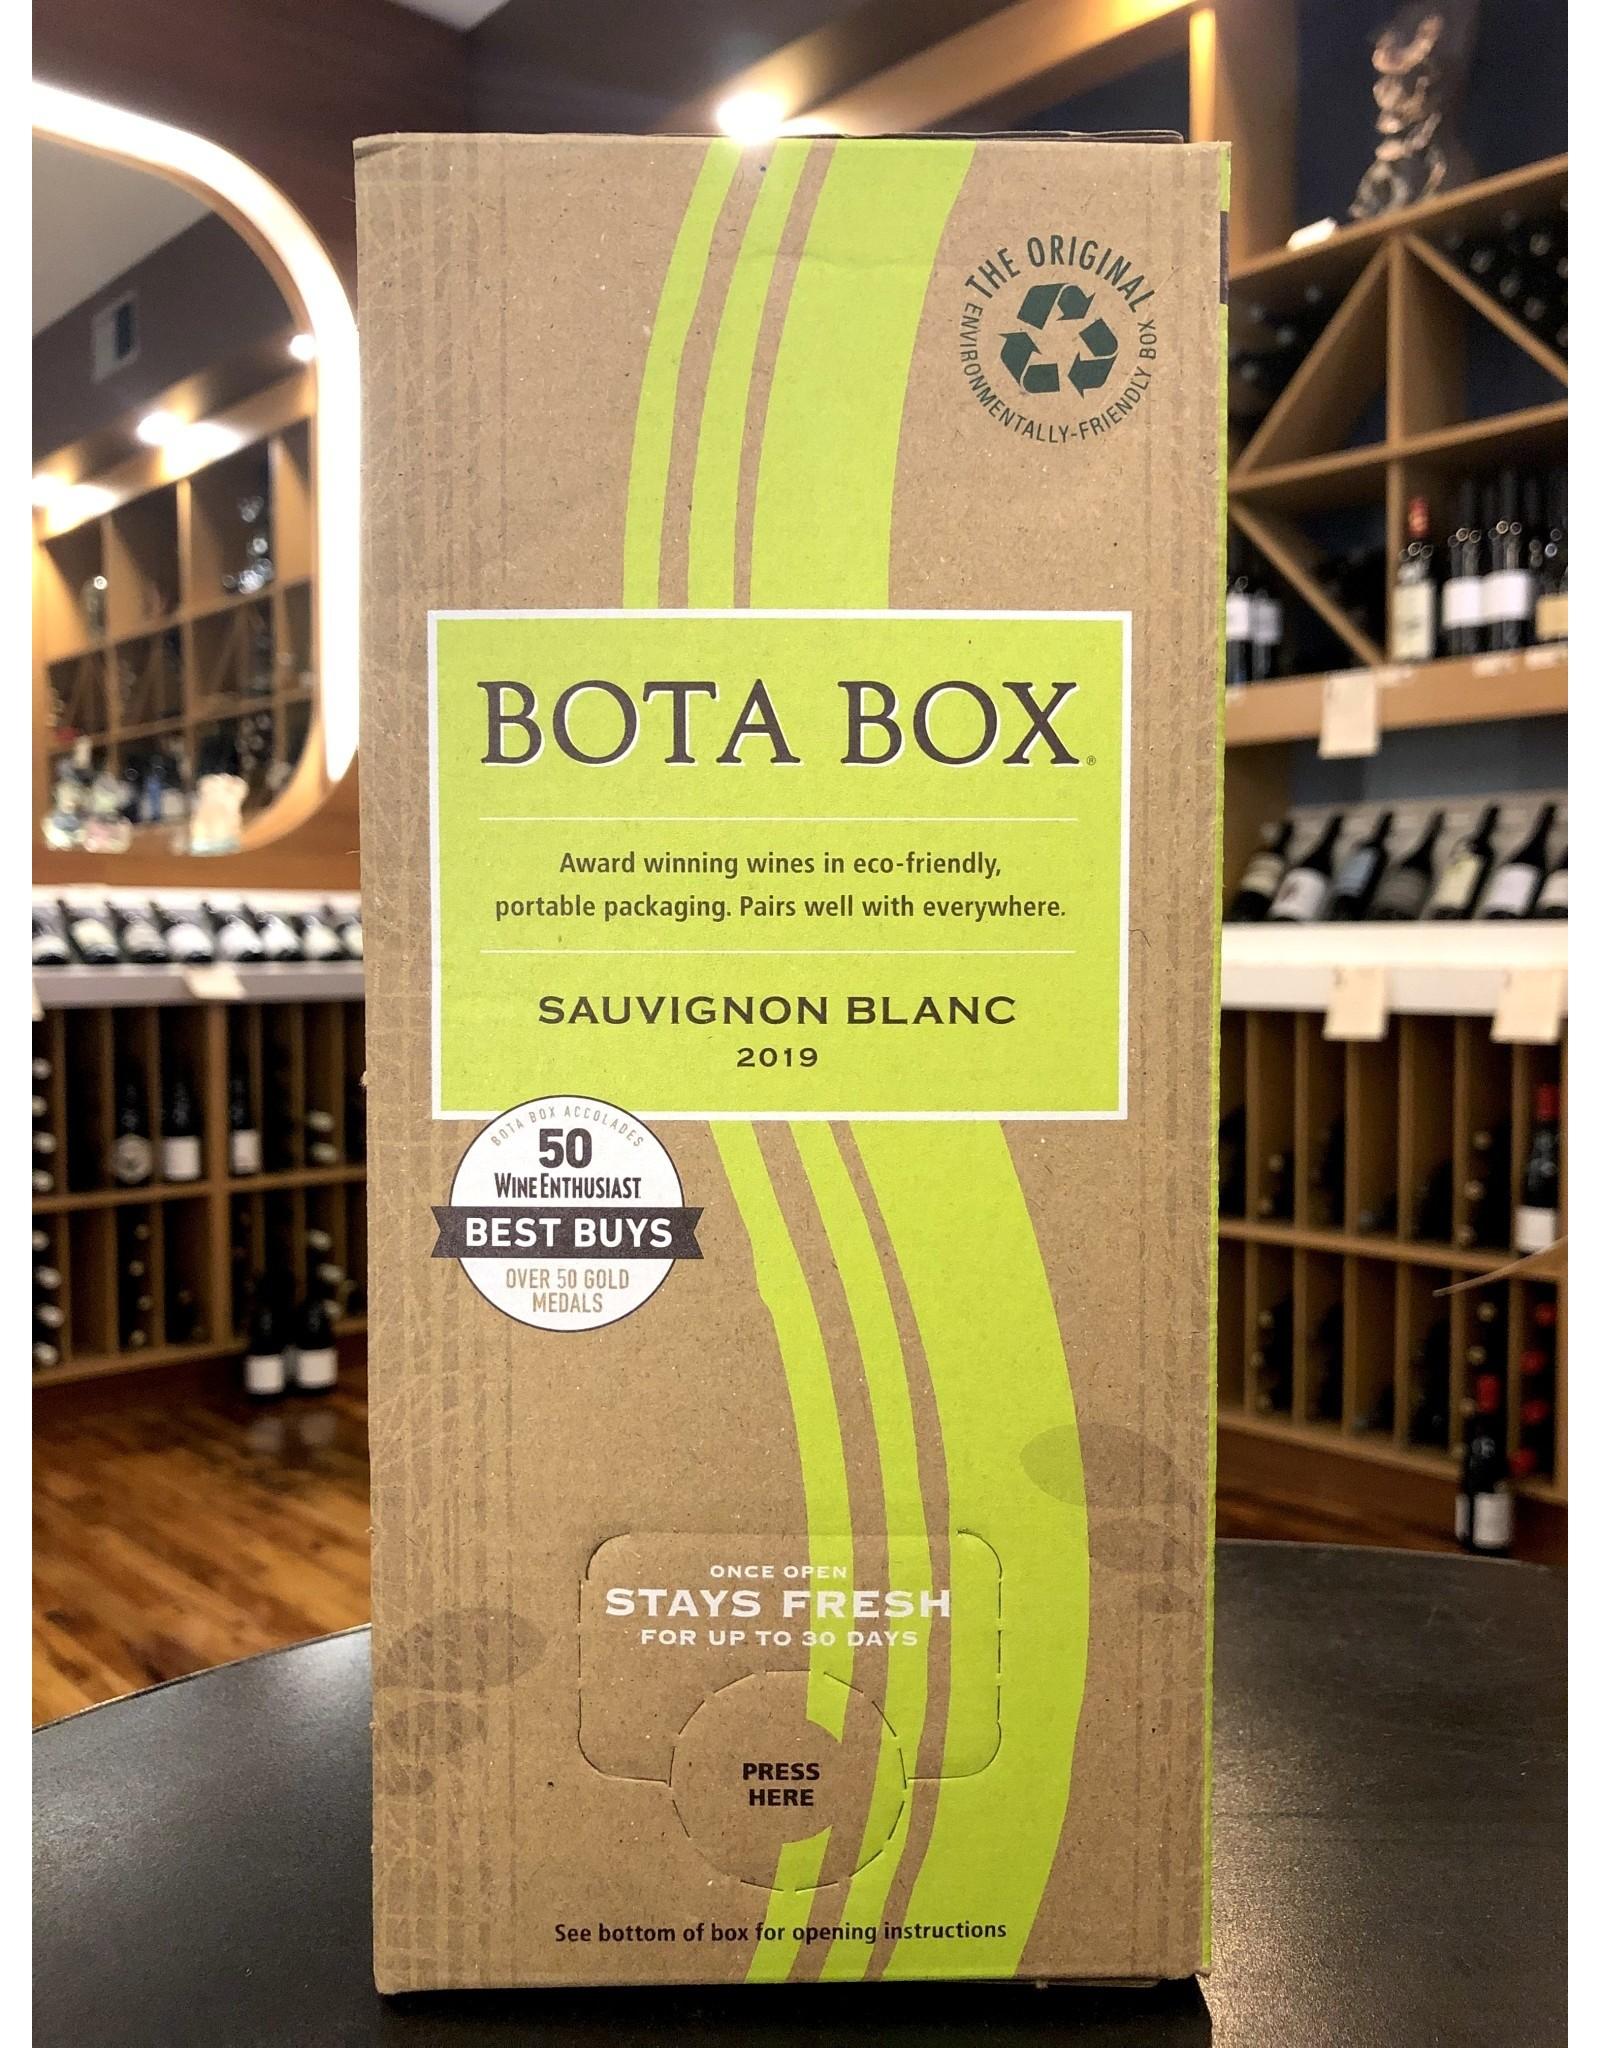 Bota Box Sauv Blanc  - 3 Liter